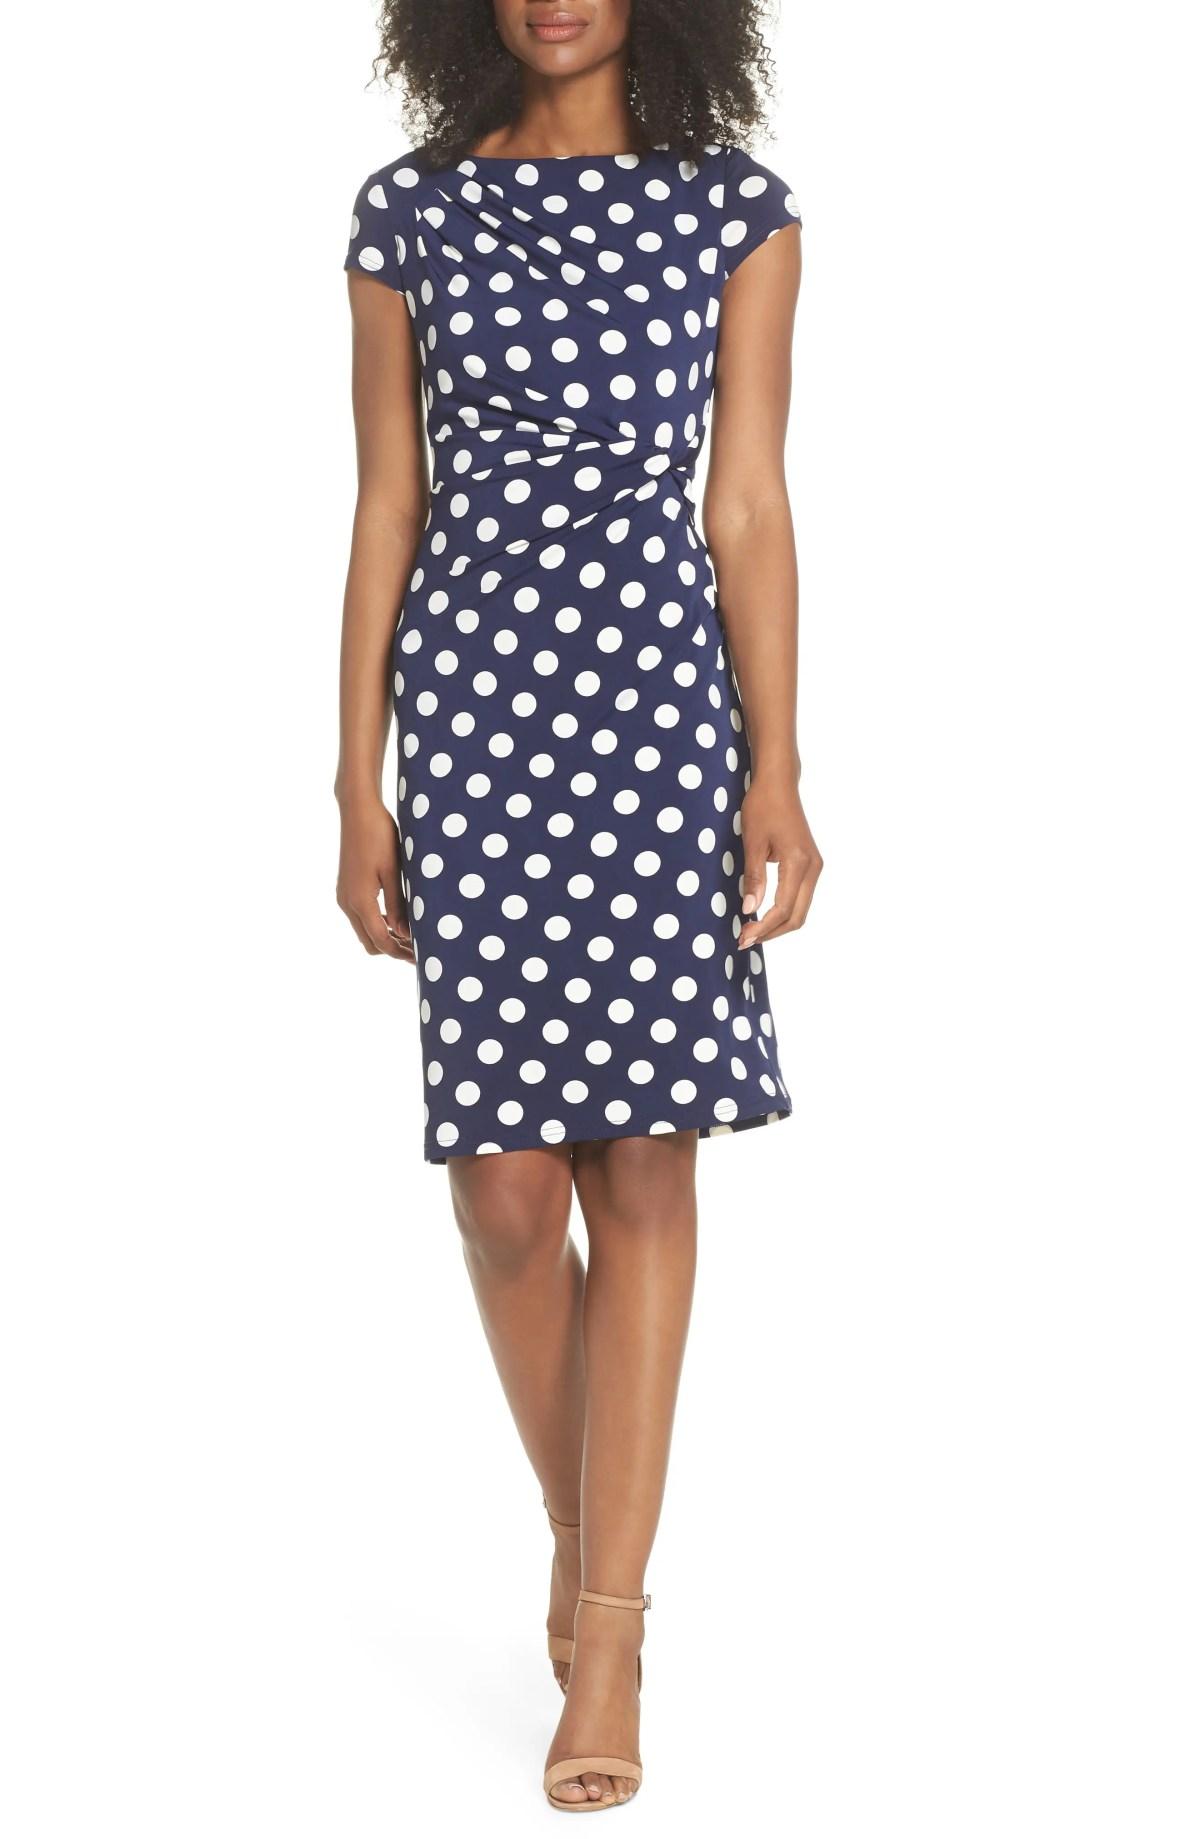 ELIZA J Polka Dot Side Twist Sheath Dress, Main, color, NAVY/ IVORY